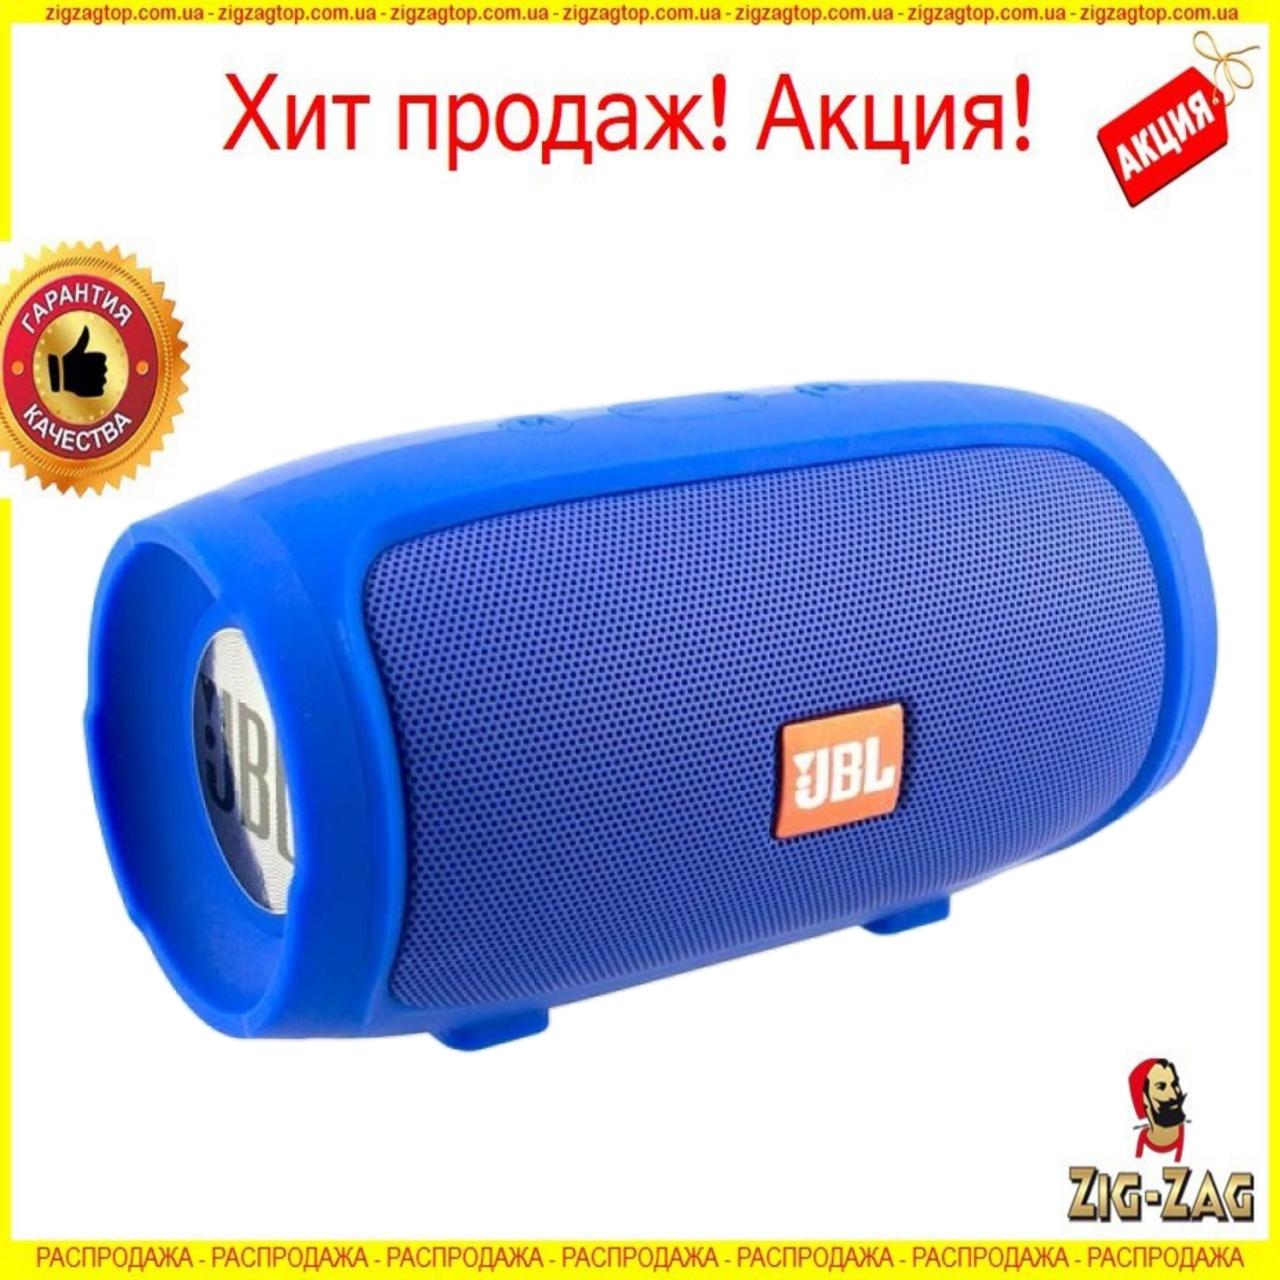 Портативна блютуз колонка JBL Charge 3 MINI колонка з USB,SD,FM СИНЯ